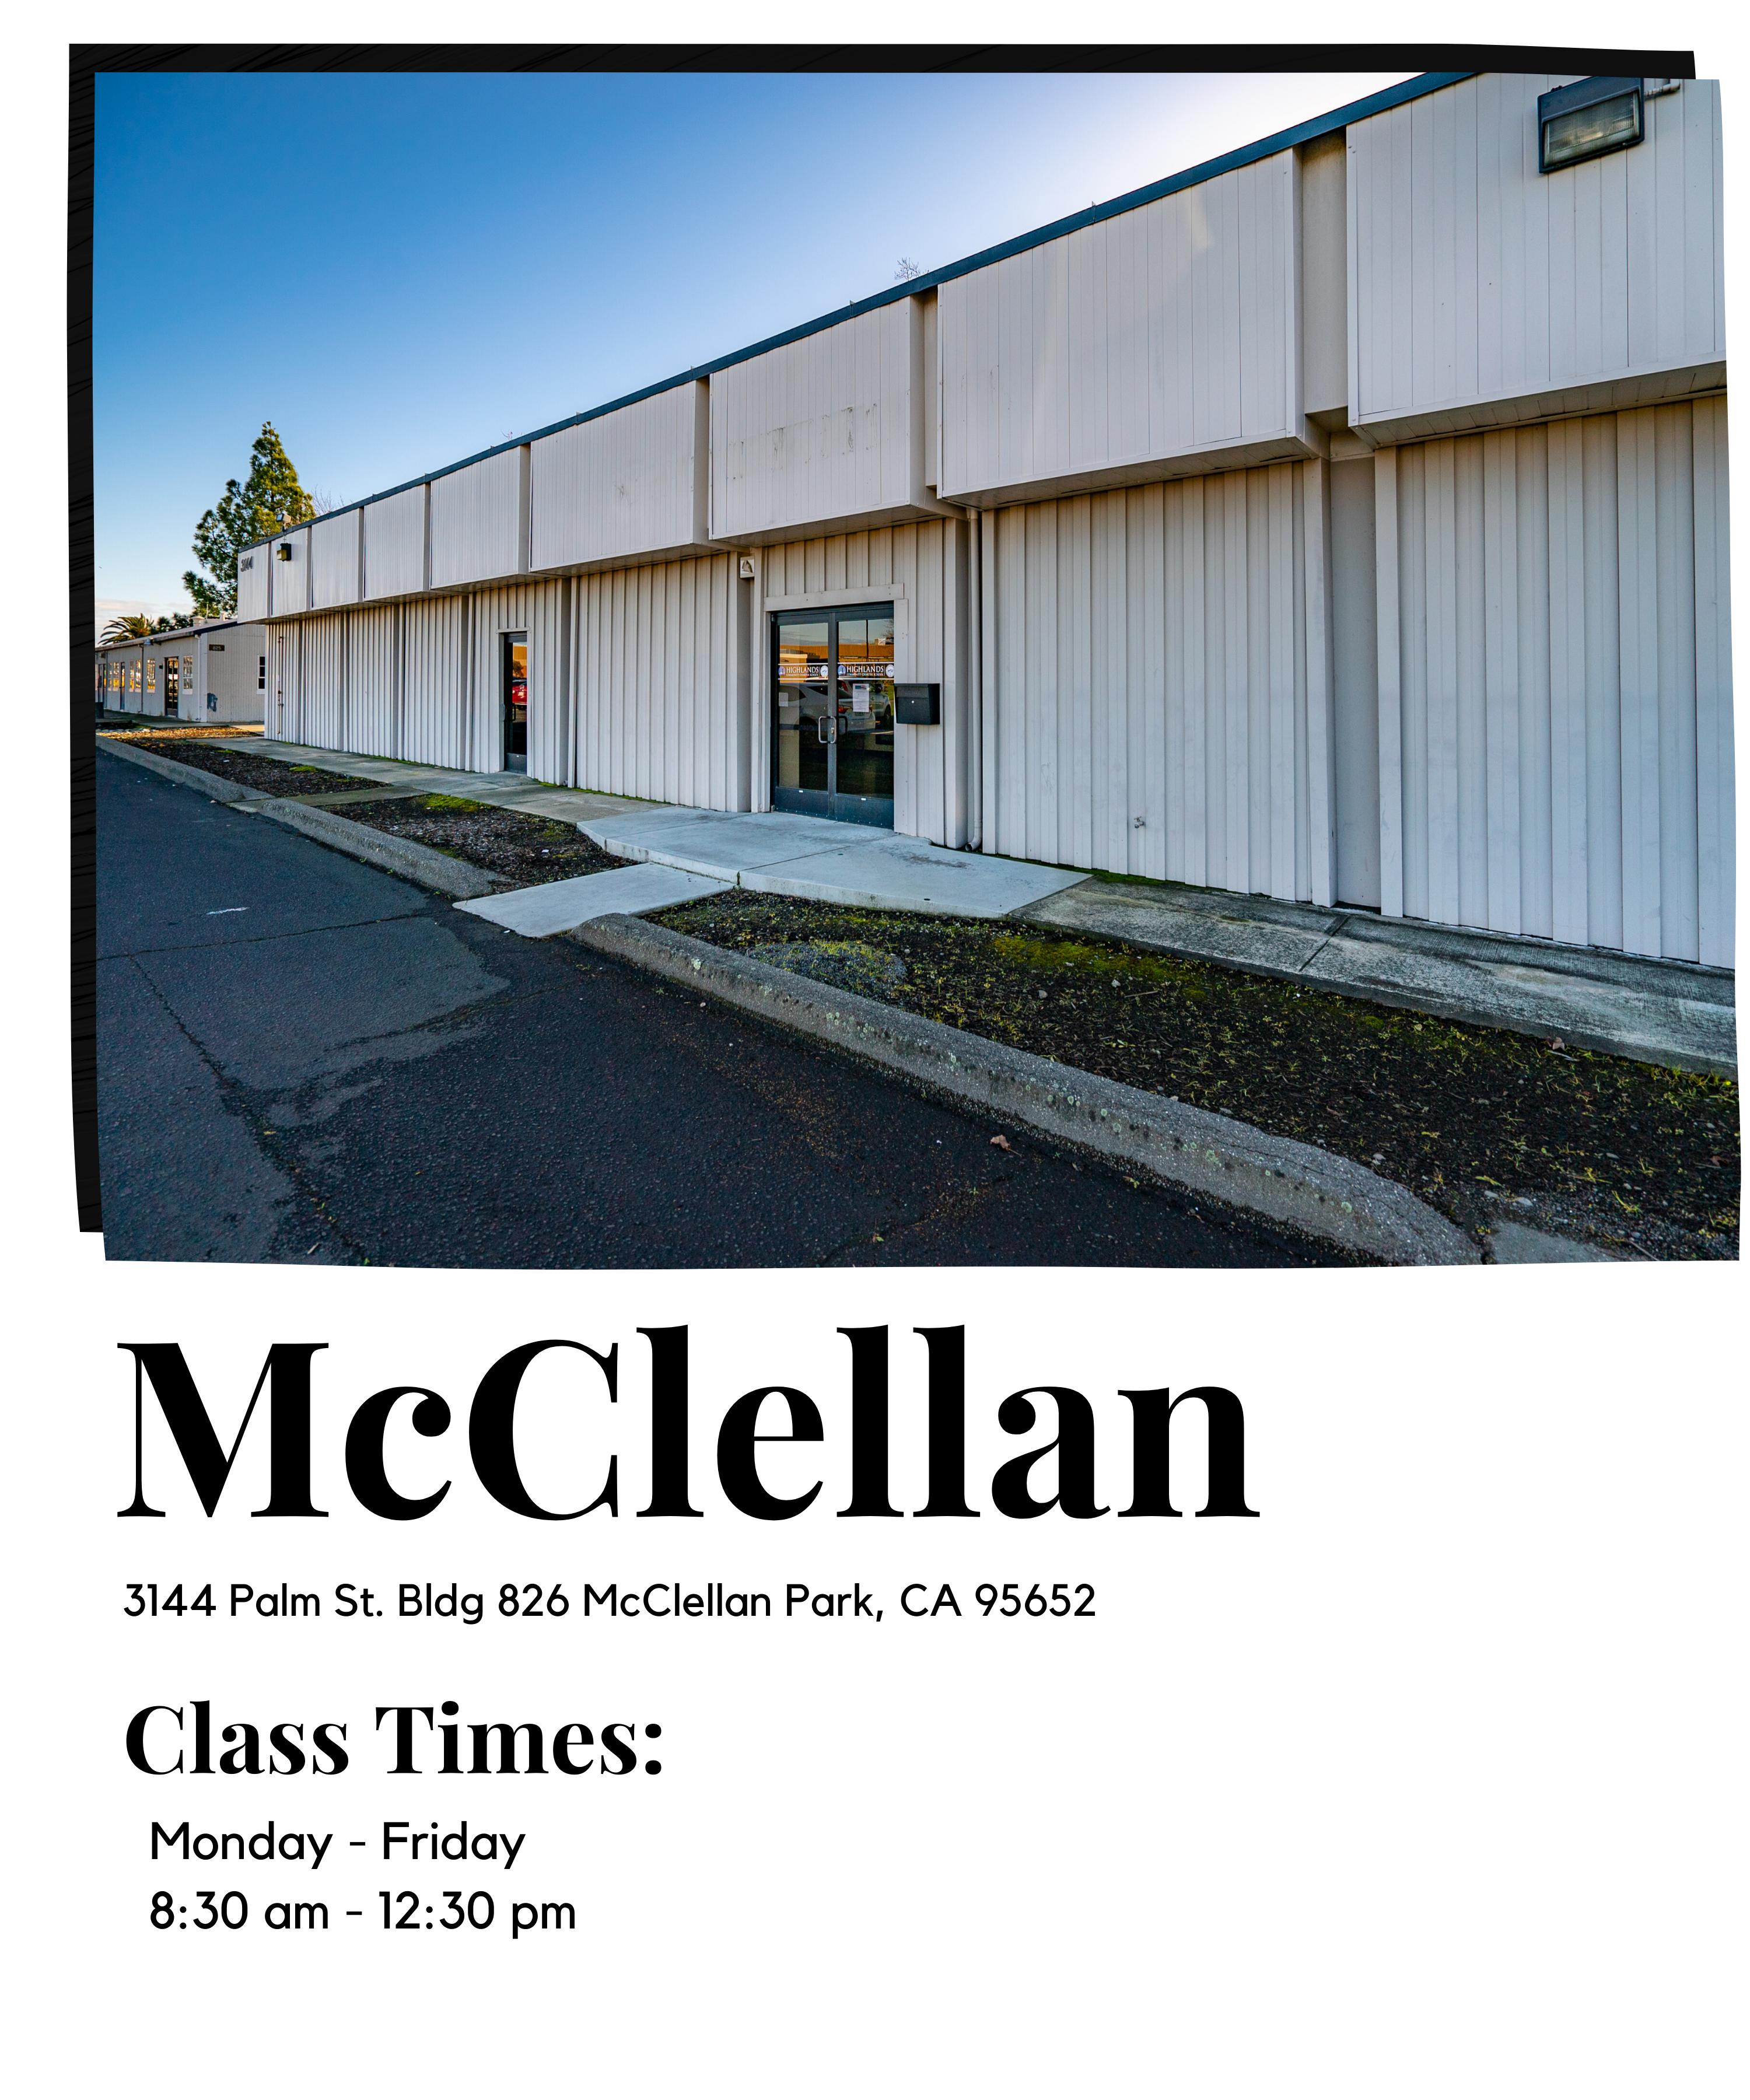 McClellan Class Times